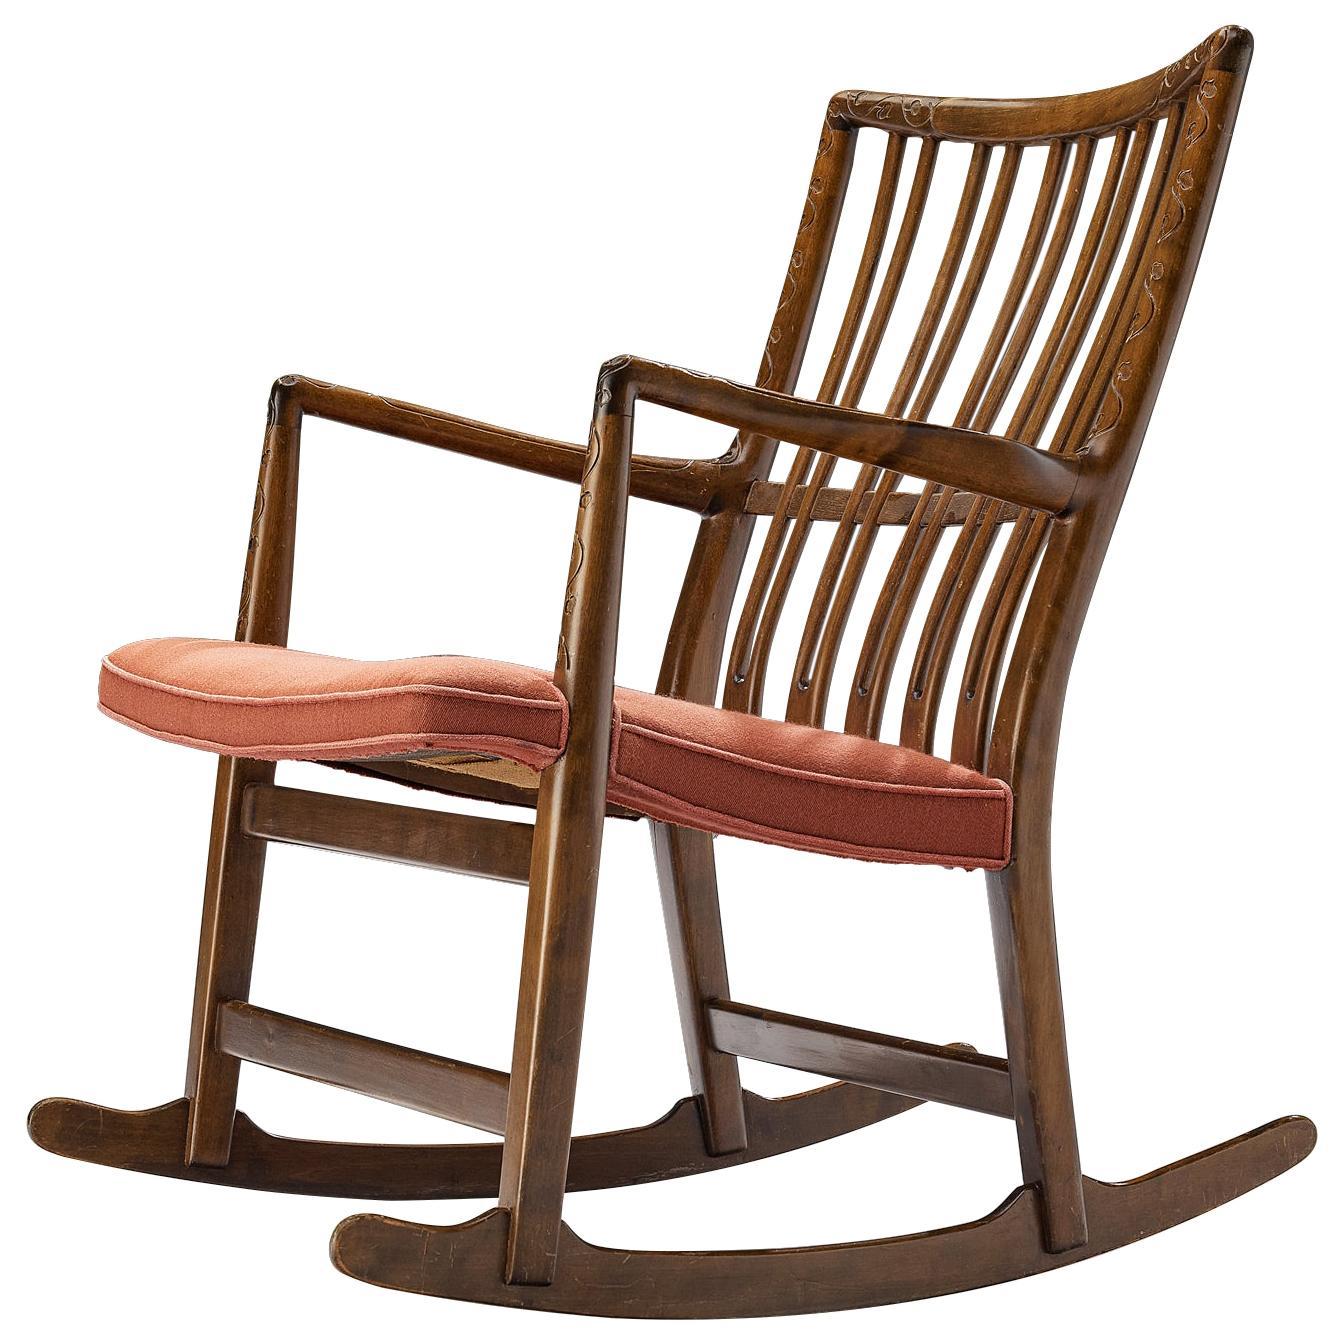 Hans Wegner Early 'ML-33' Rocking Chair